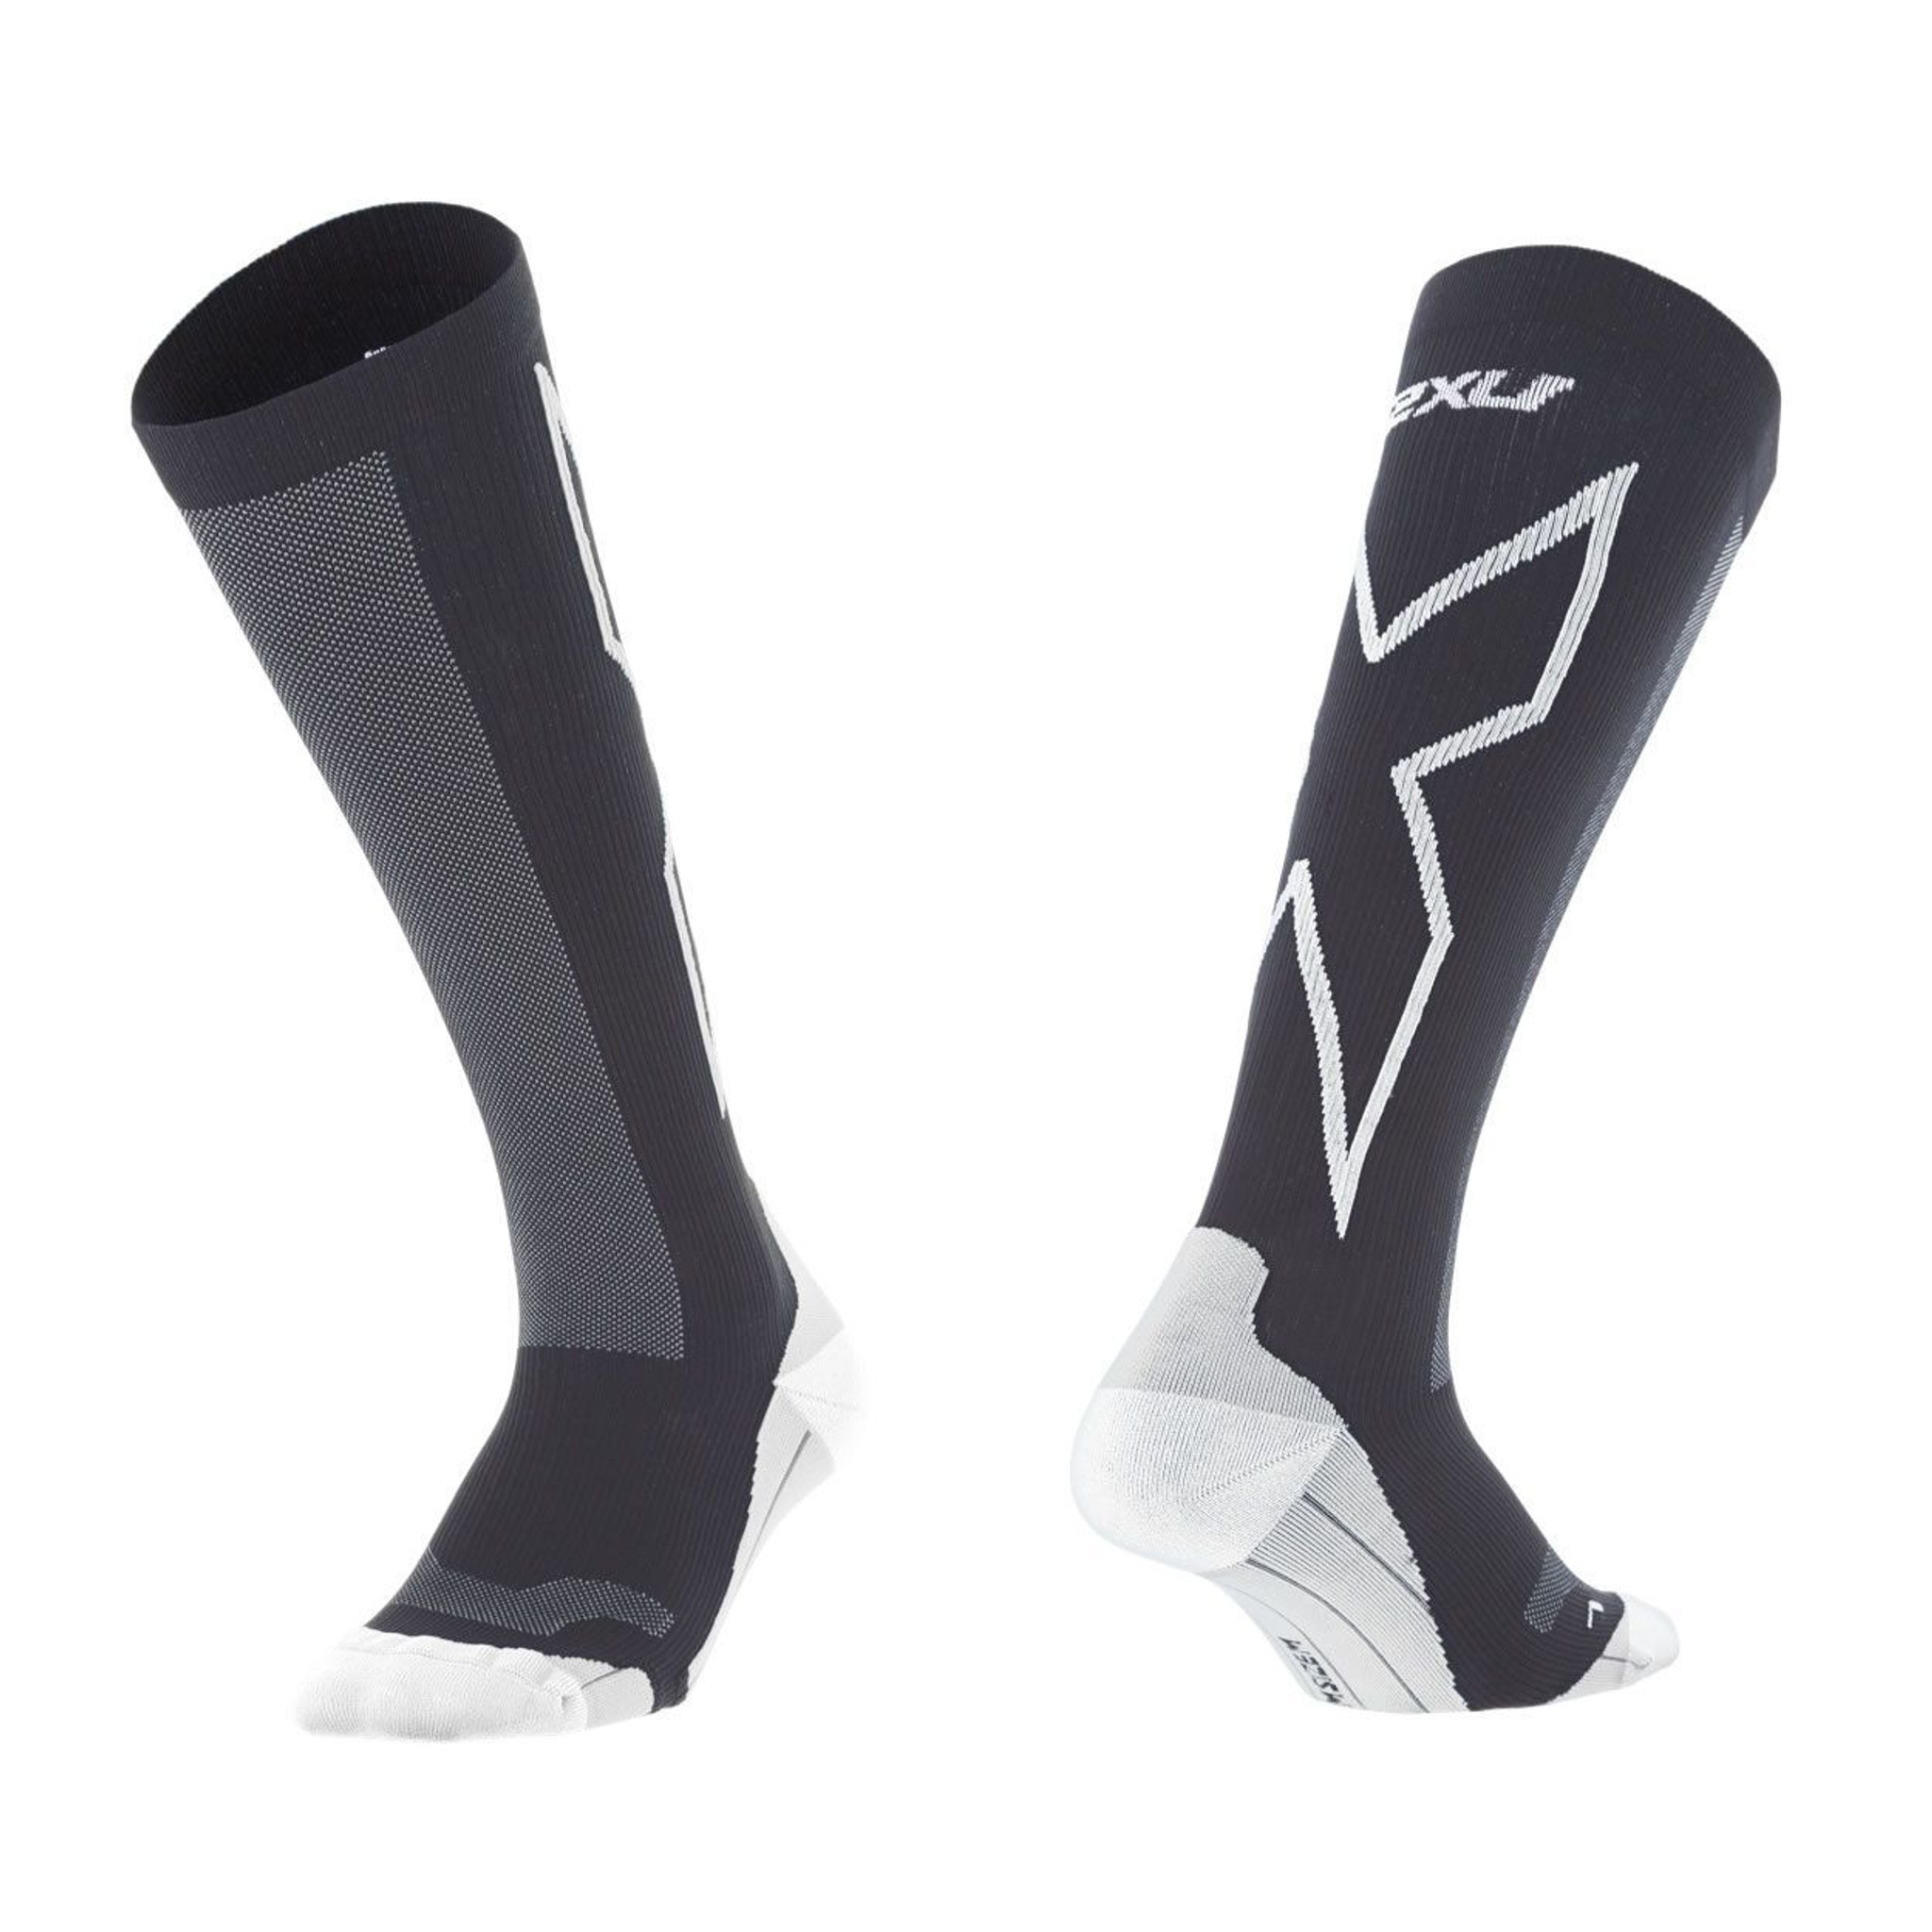 2XU Performance Compression Circulation Recovery Race Training Running Socks NEW